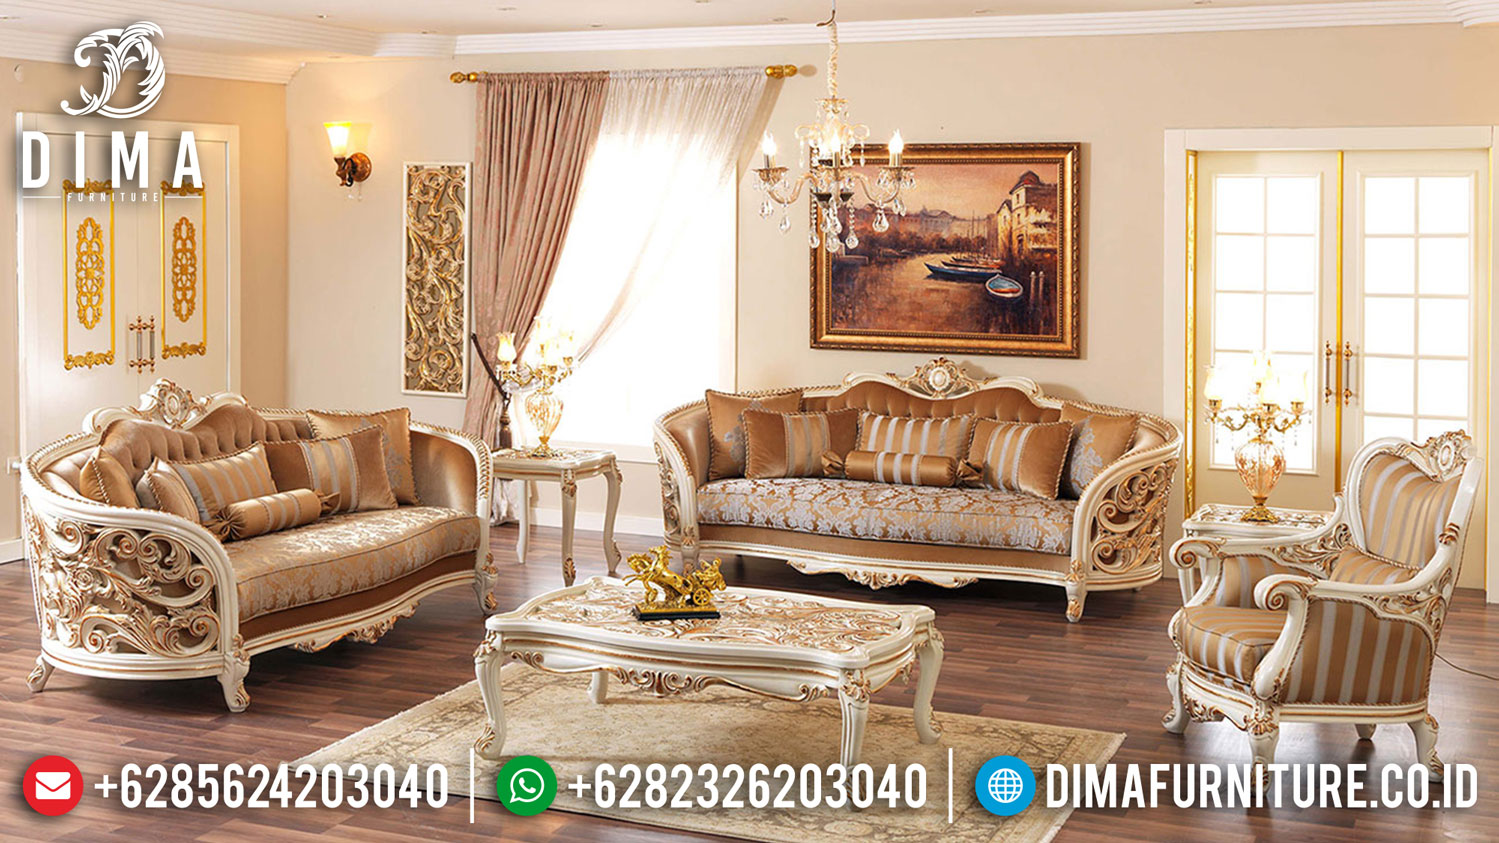 Harga Sofa Tamu Mewah Luxury Carving Christmas Edition Sale Up To 30 % Off TTJ-1234